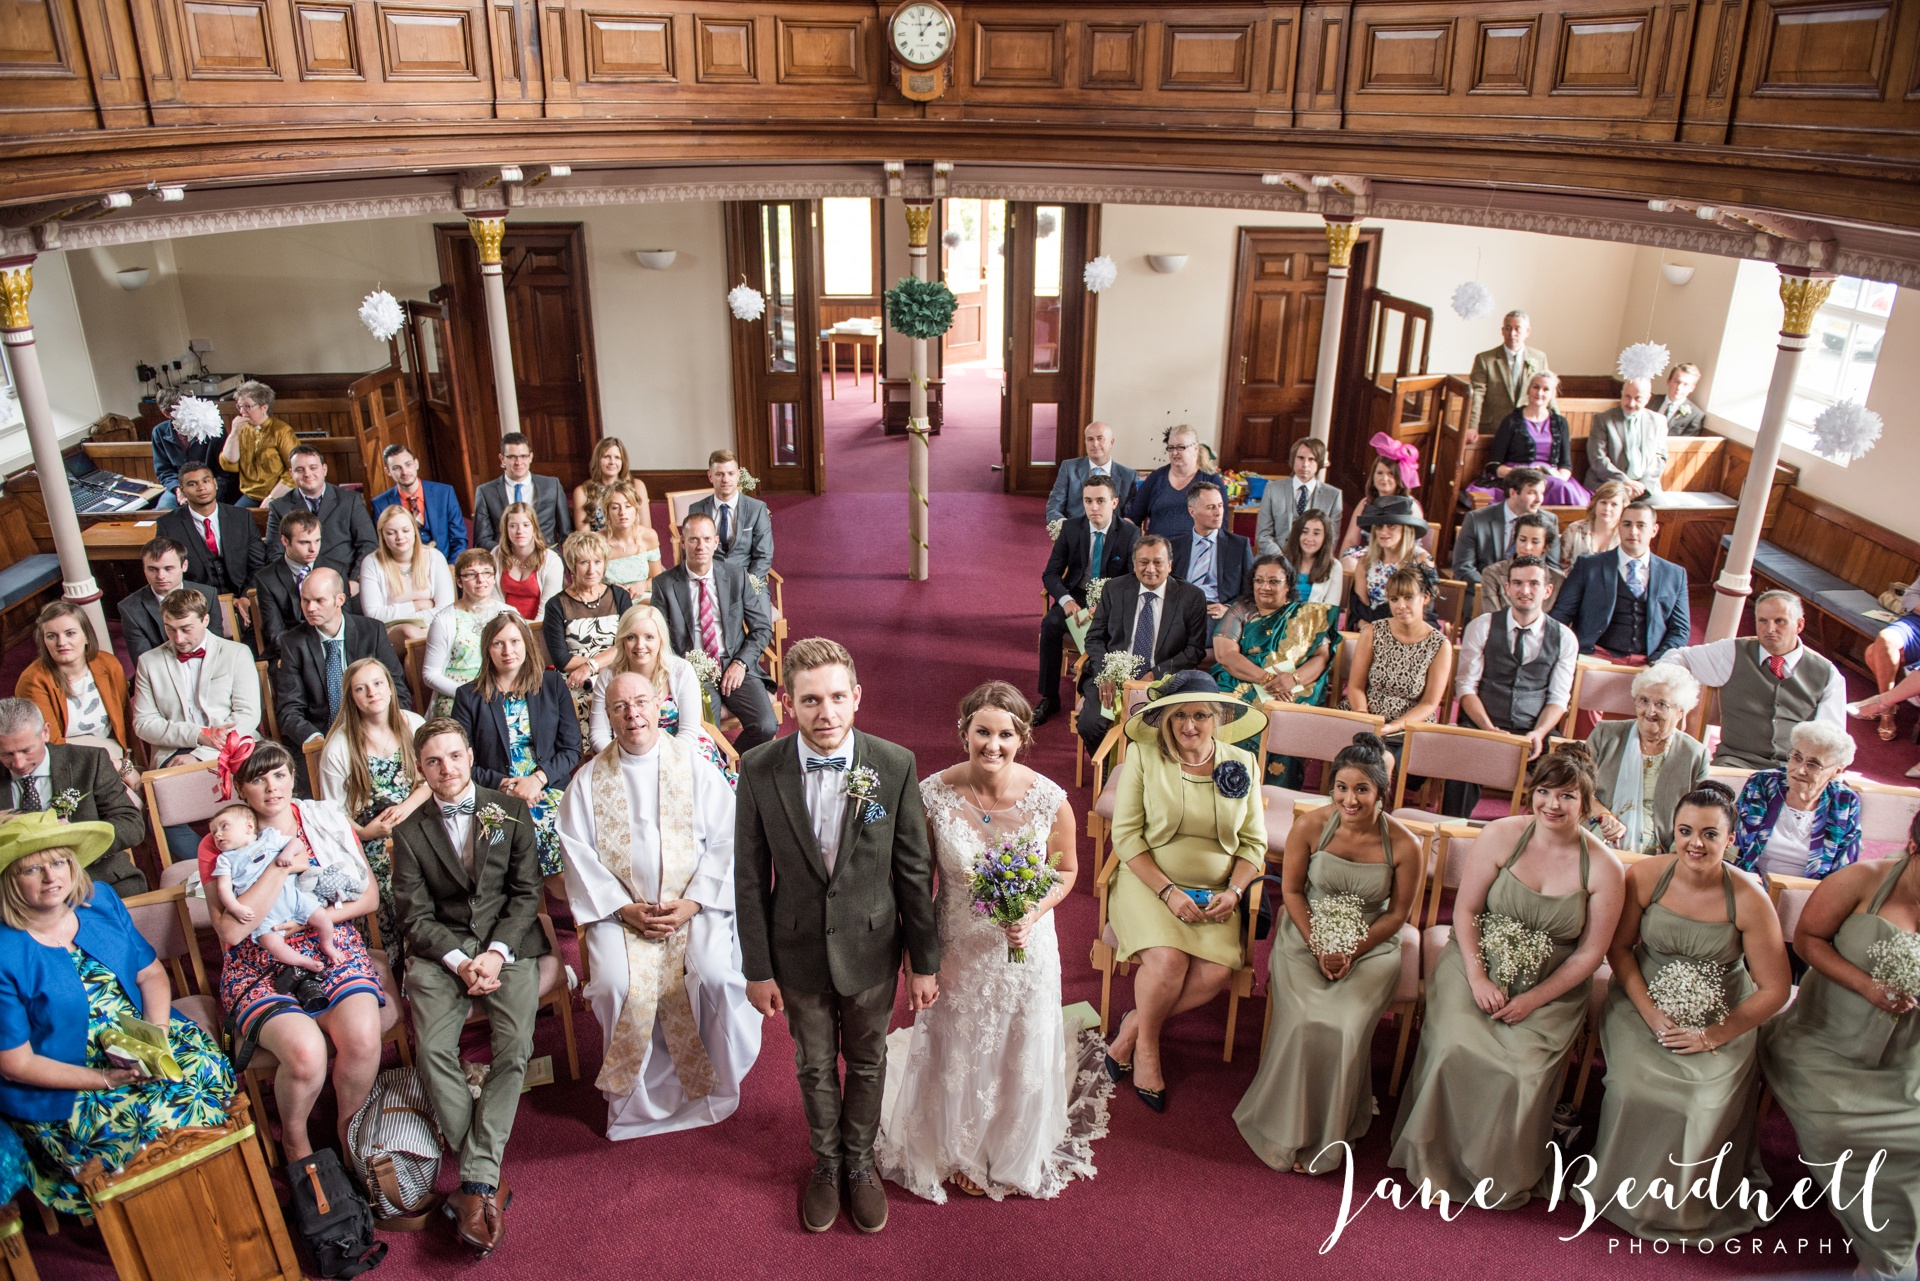 Jane Beadnell fine art wedding photographer The Old Deanery Ripon_0041